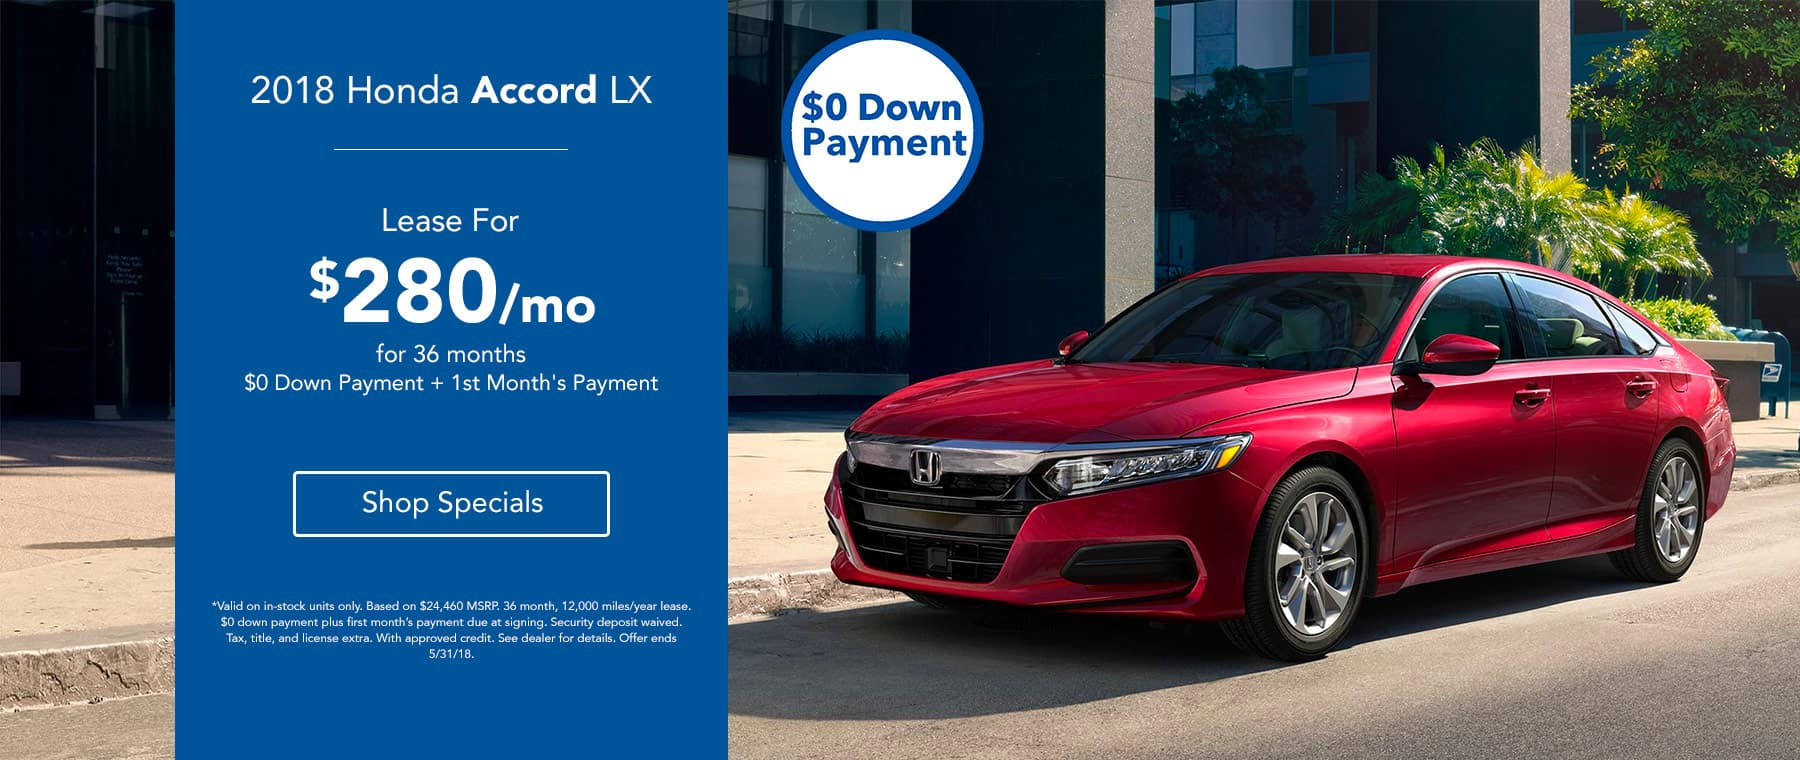 2018 Honda Accord LX - Lease for $280/mo